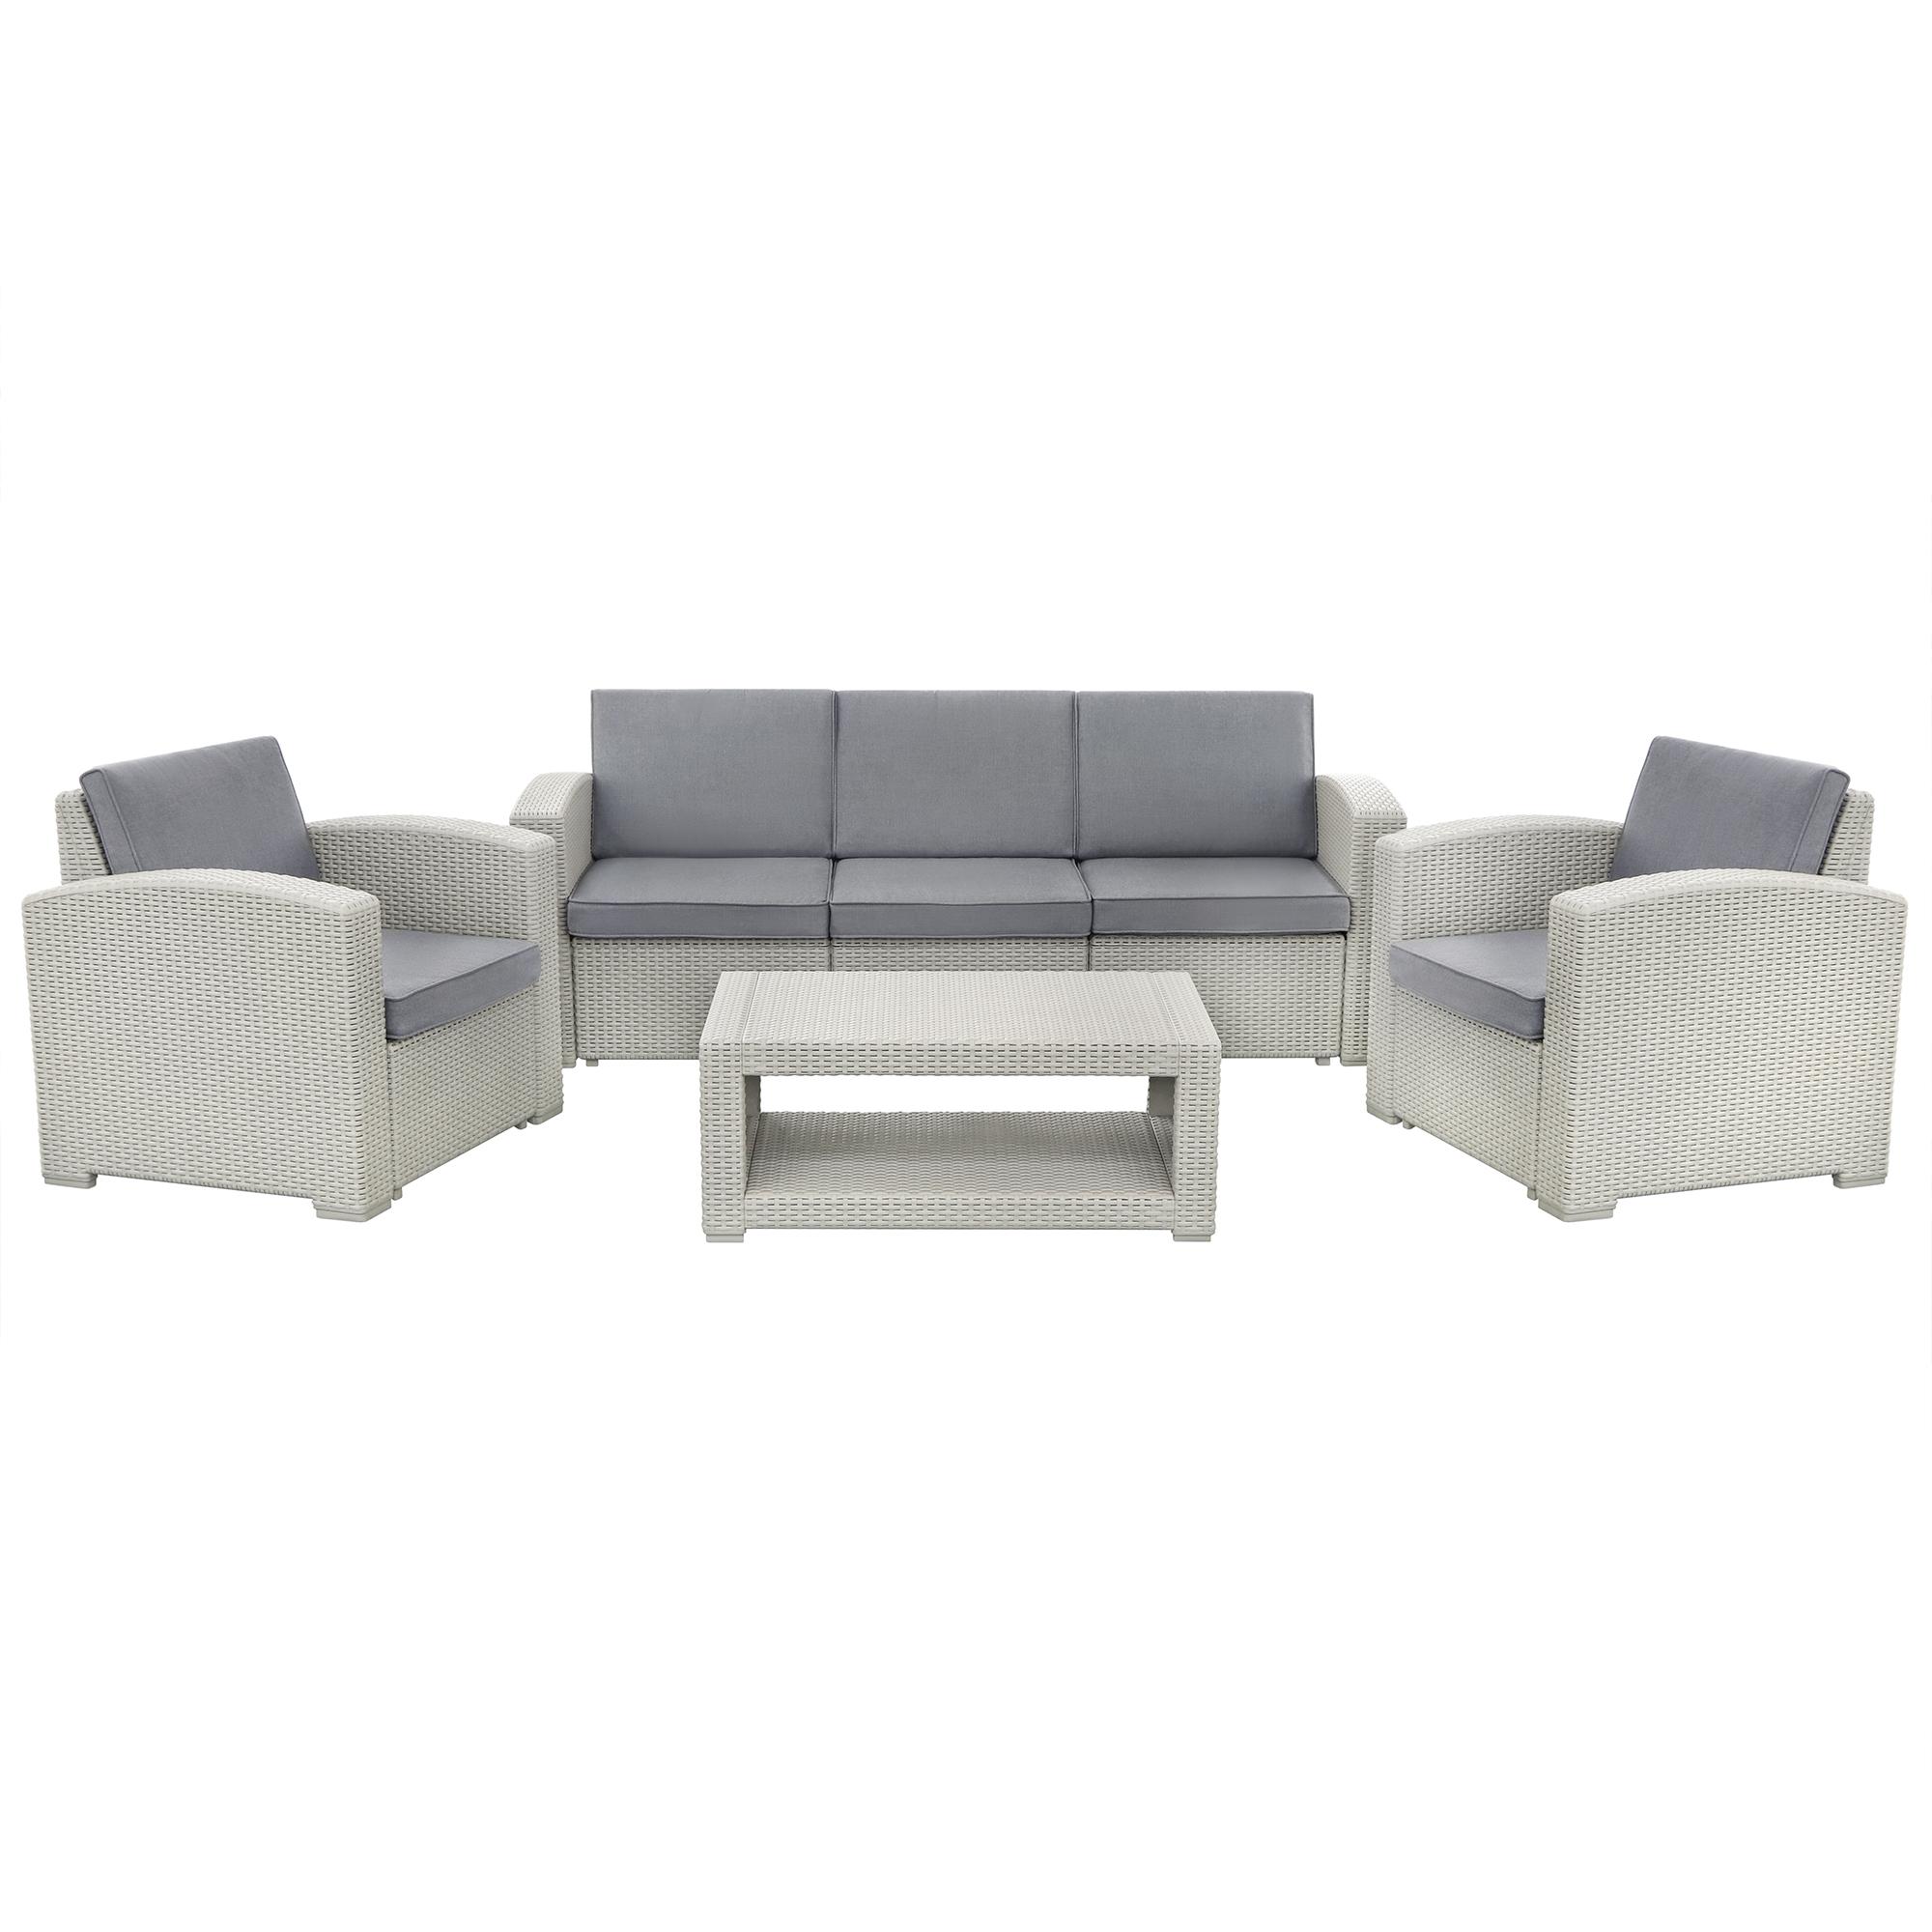 Комплект мебели LF 4 предмета